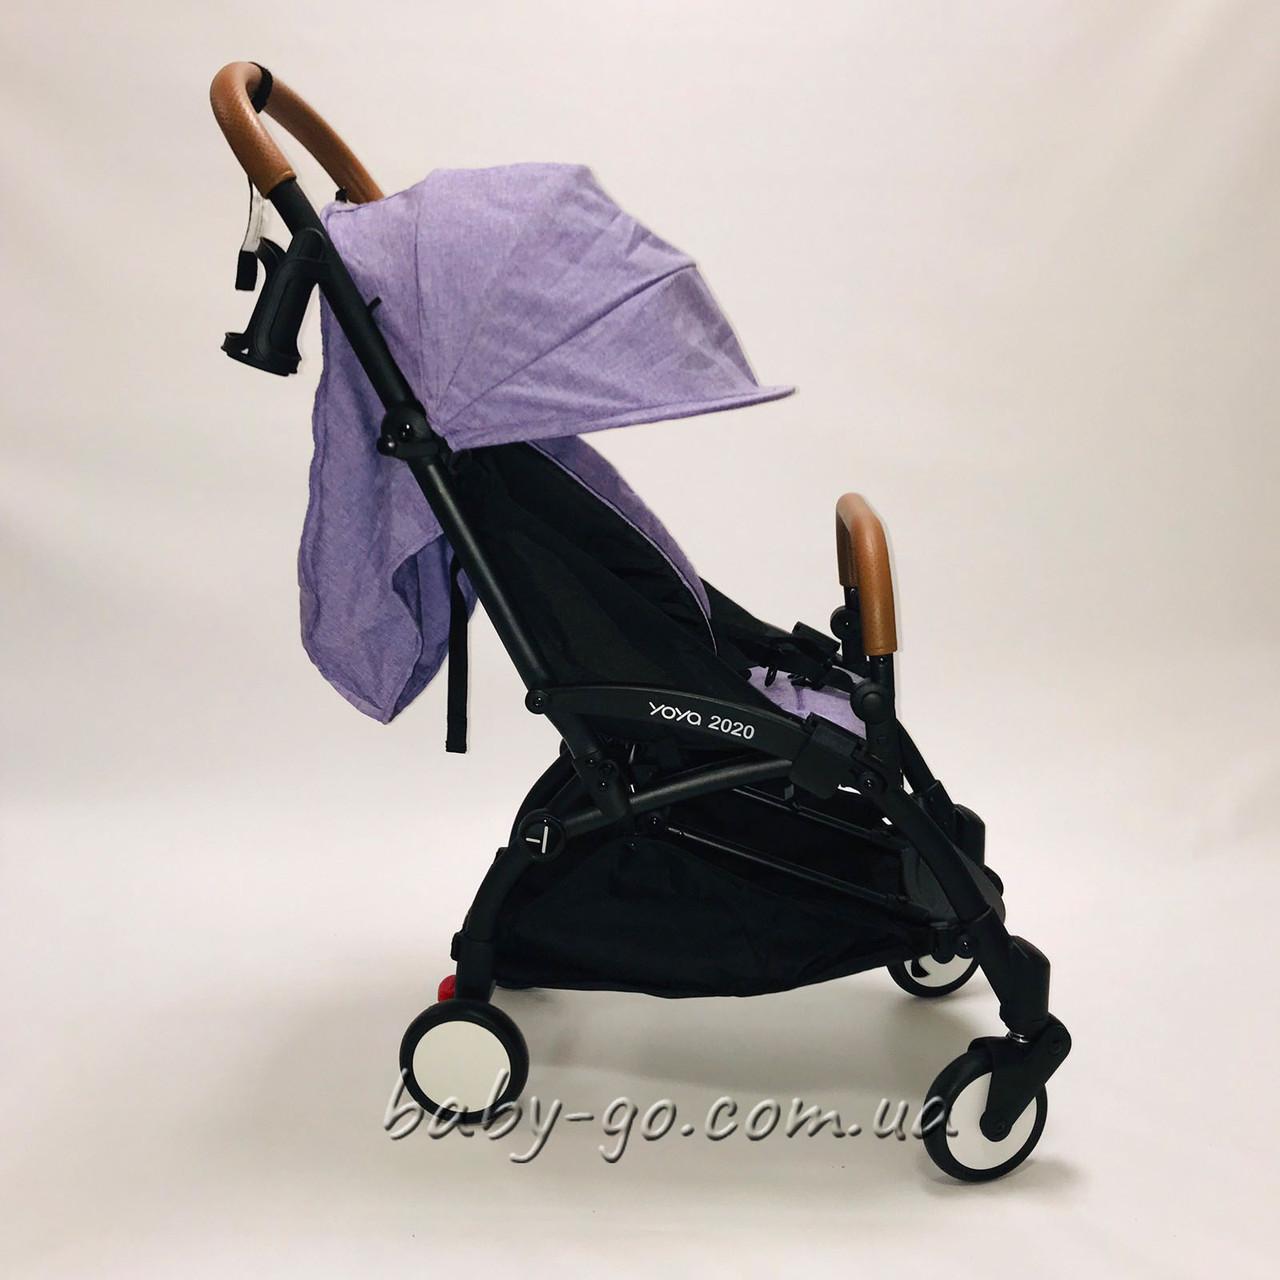 Коляска фиолетовая лён Yoya 2020 175 A+